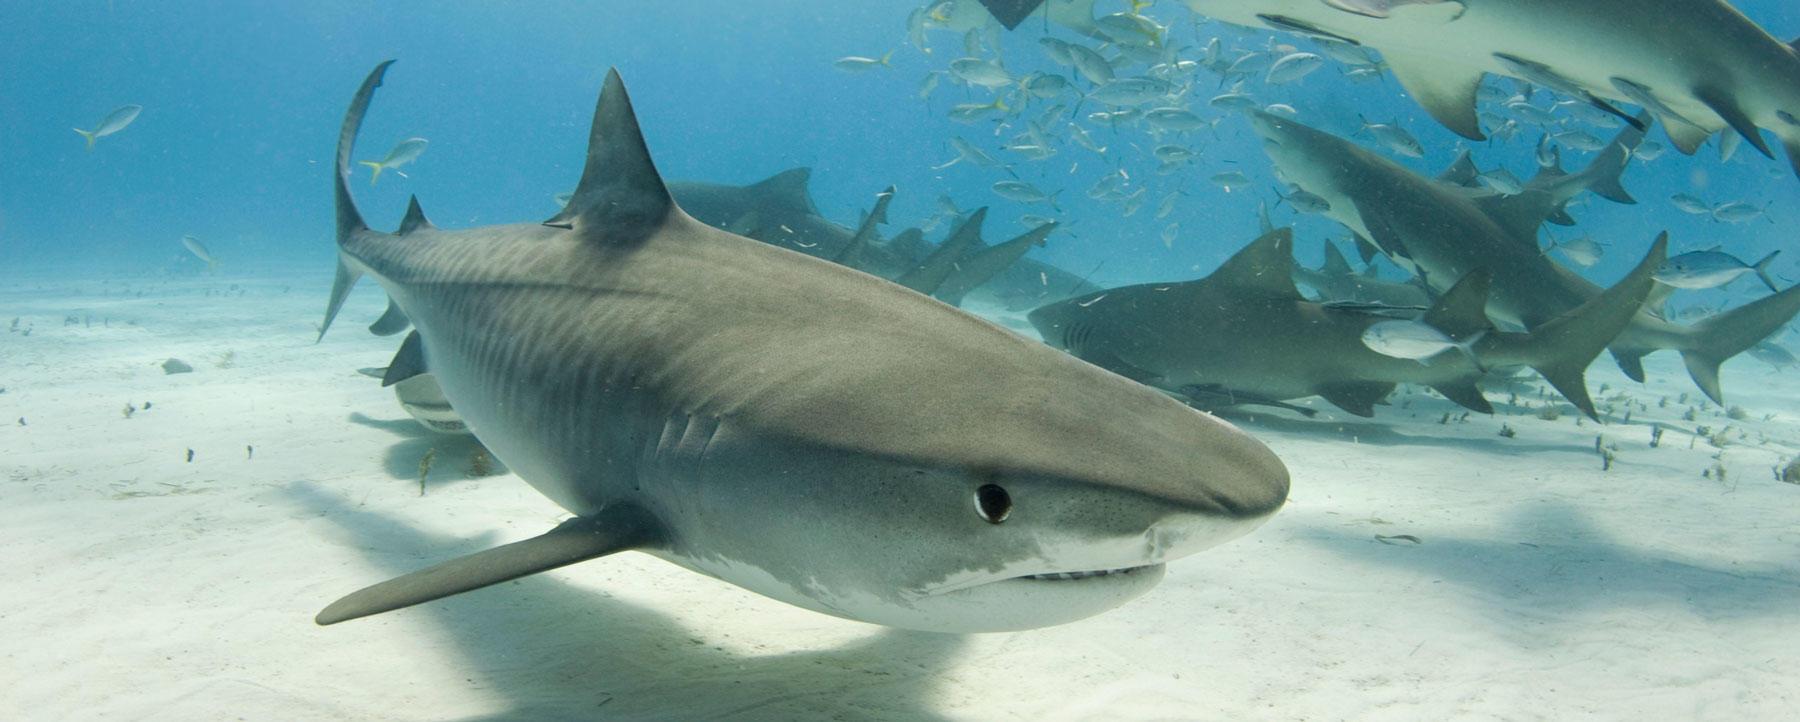 Tiger shark and feeding frenzy